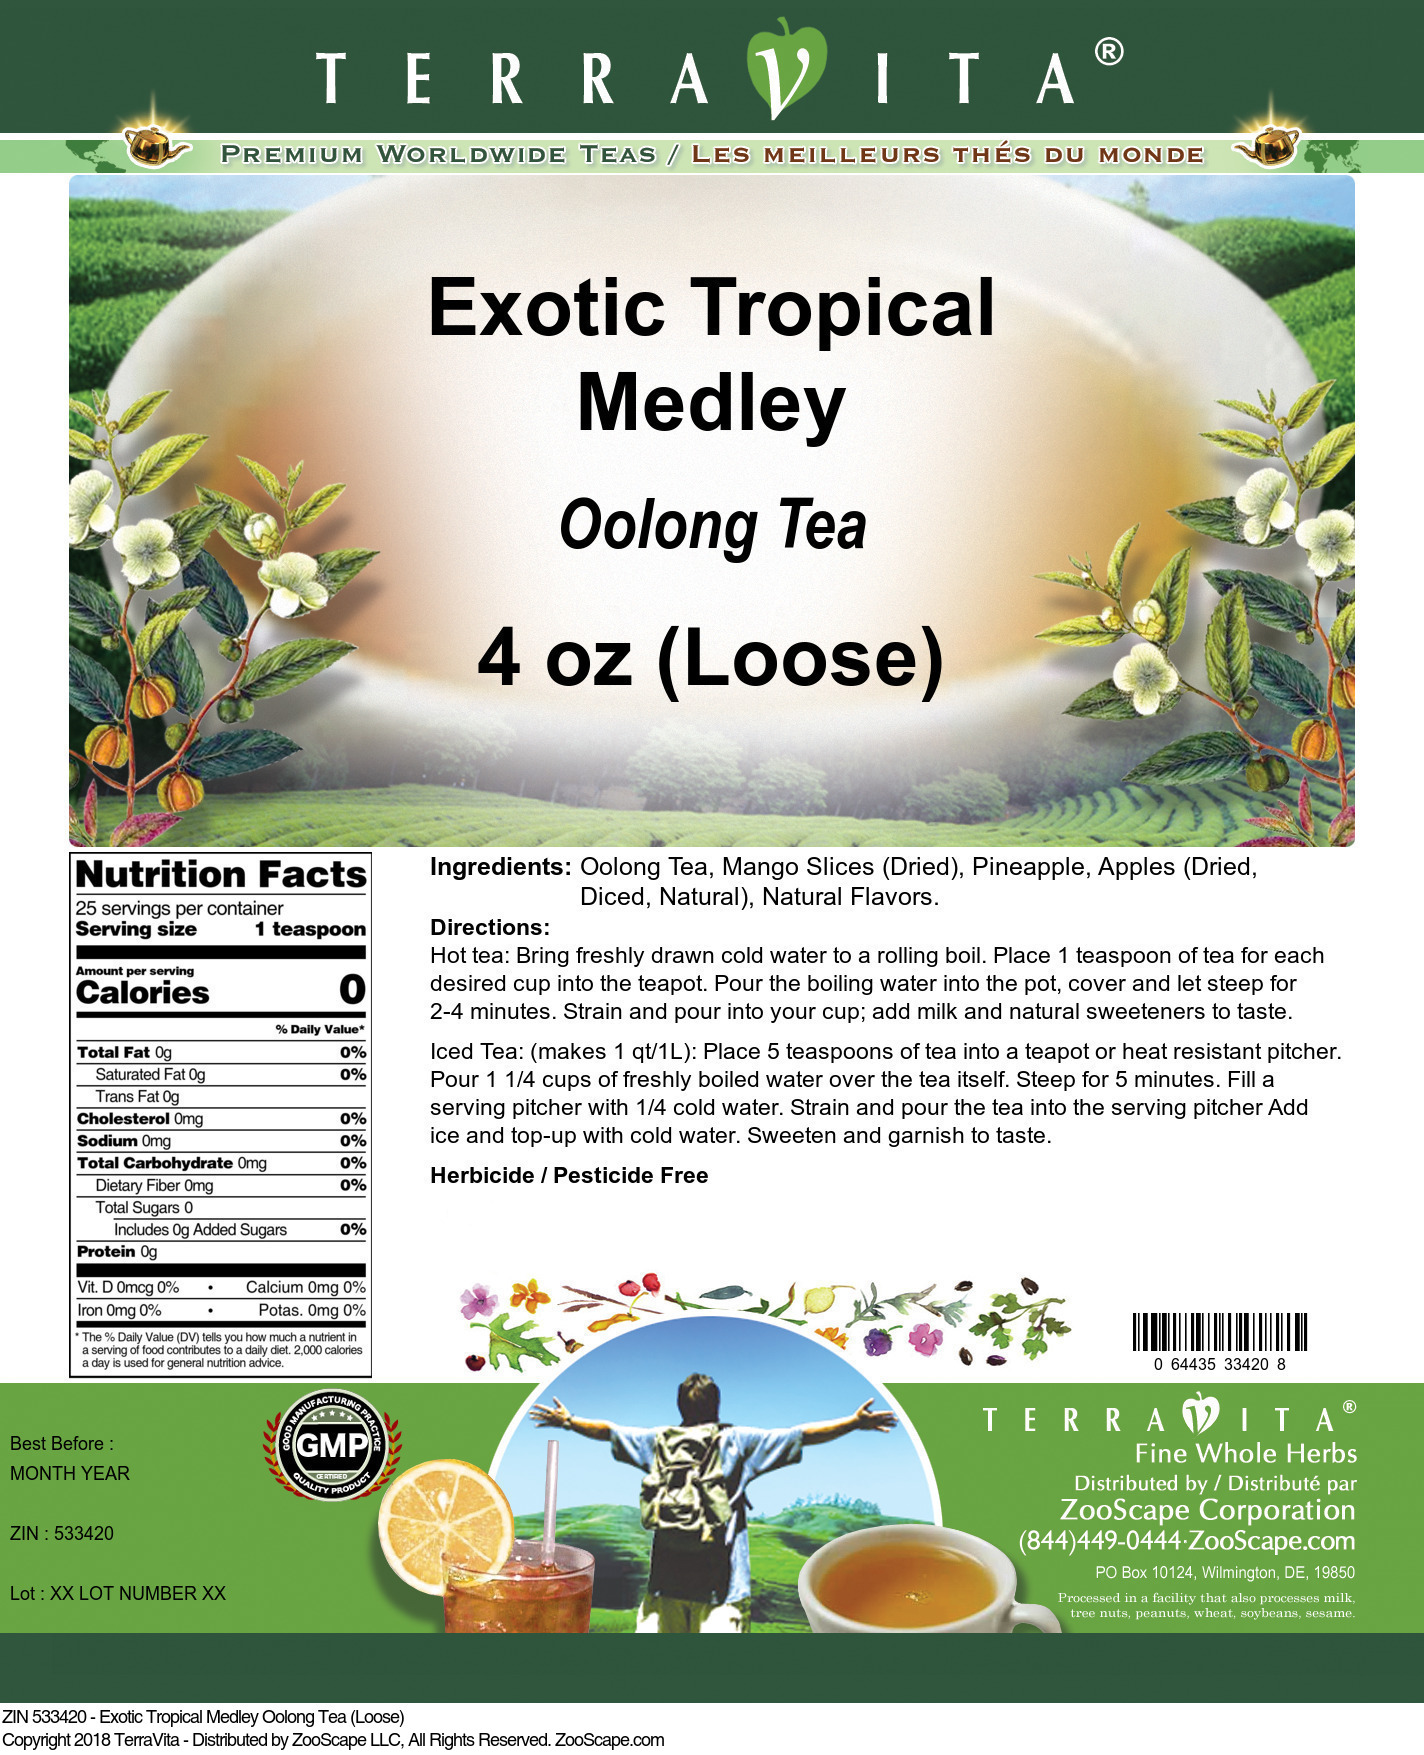 Exotic Tropical Medley Oolong Tea (Loose)